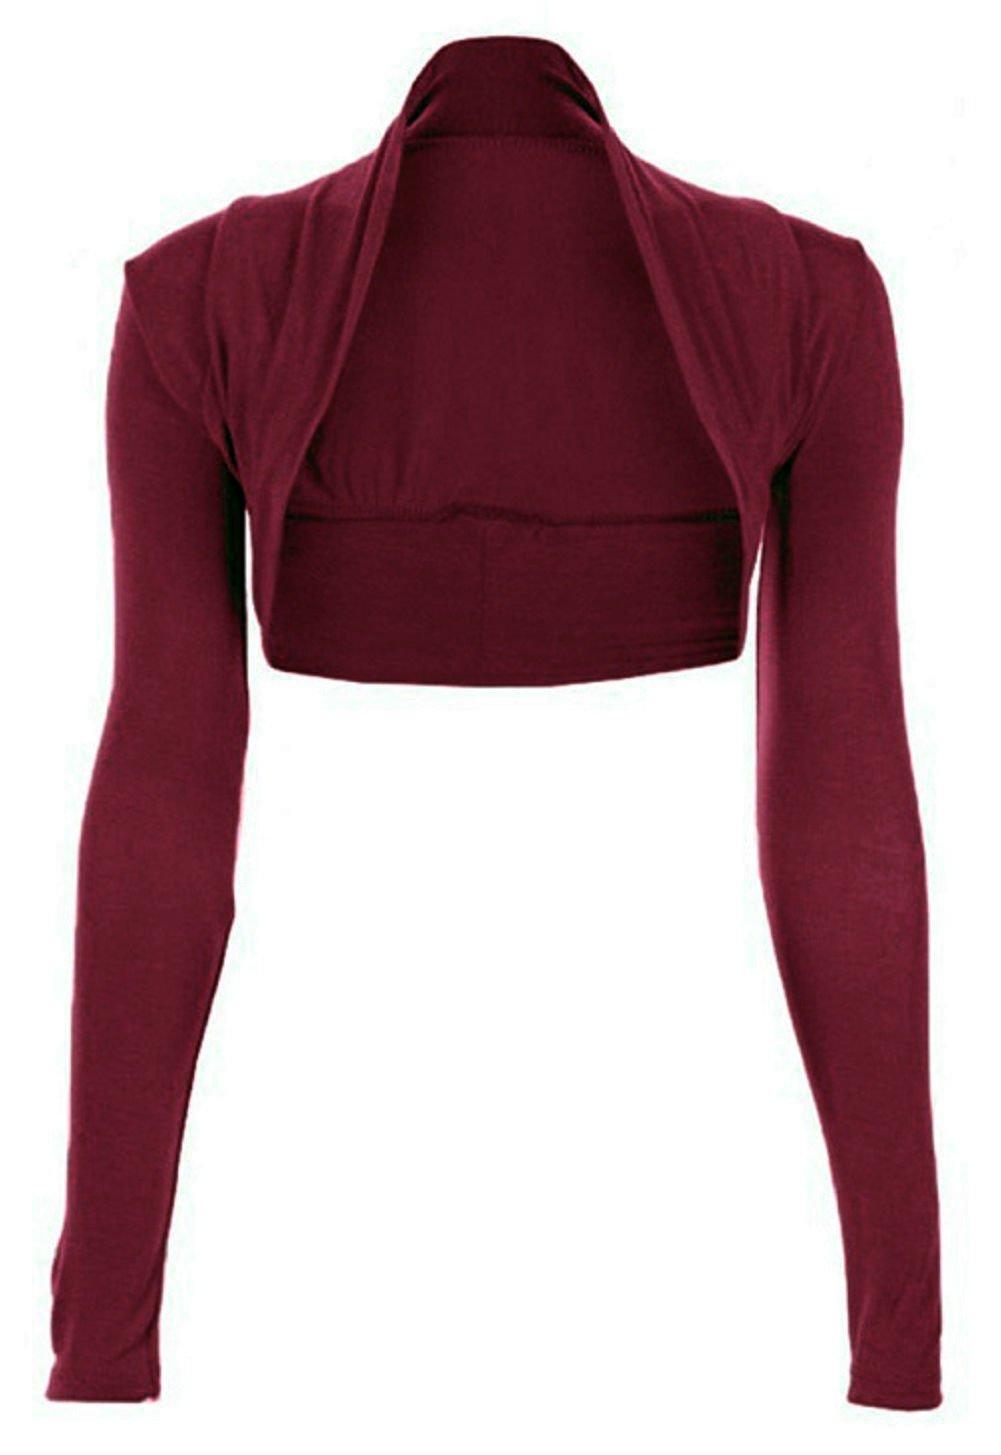 R KON Women's Long Sleeve Plain Bolero Shrugs Crop TOP